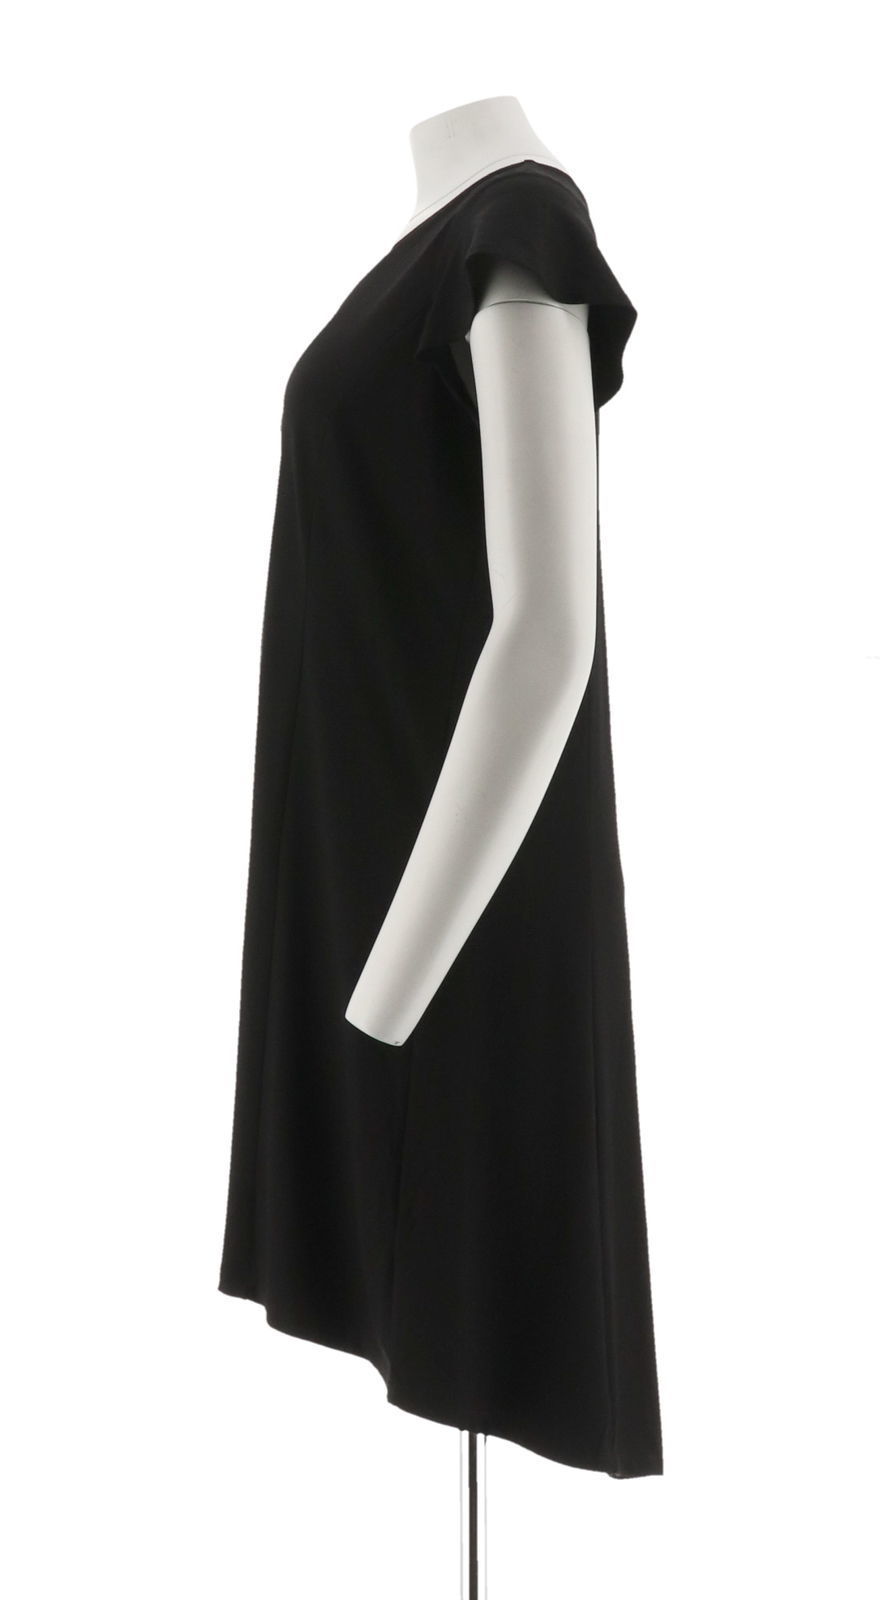 H Halston Petite Knit Crepe Dress Cutout Black PS NEW A308103 image 2